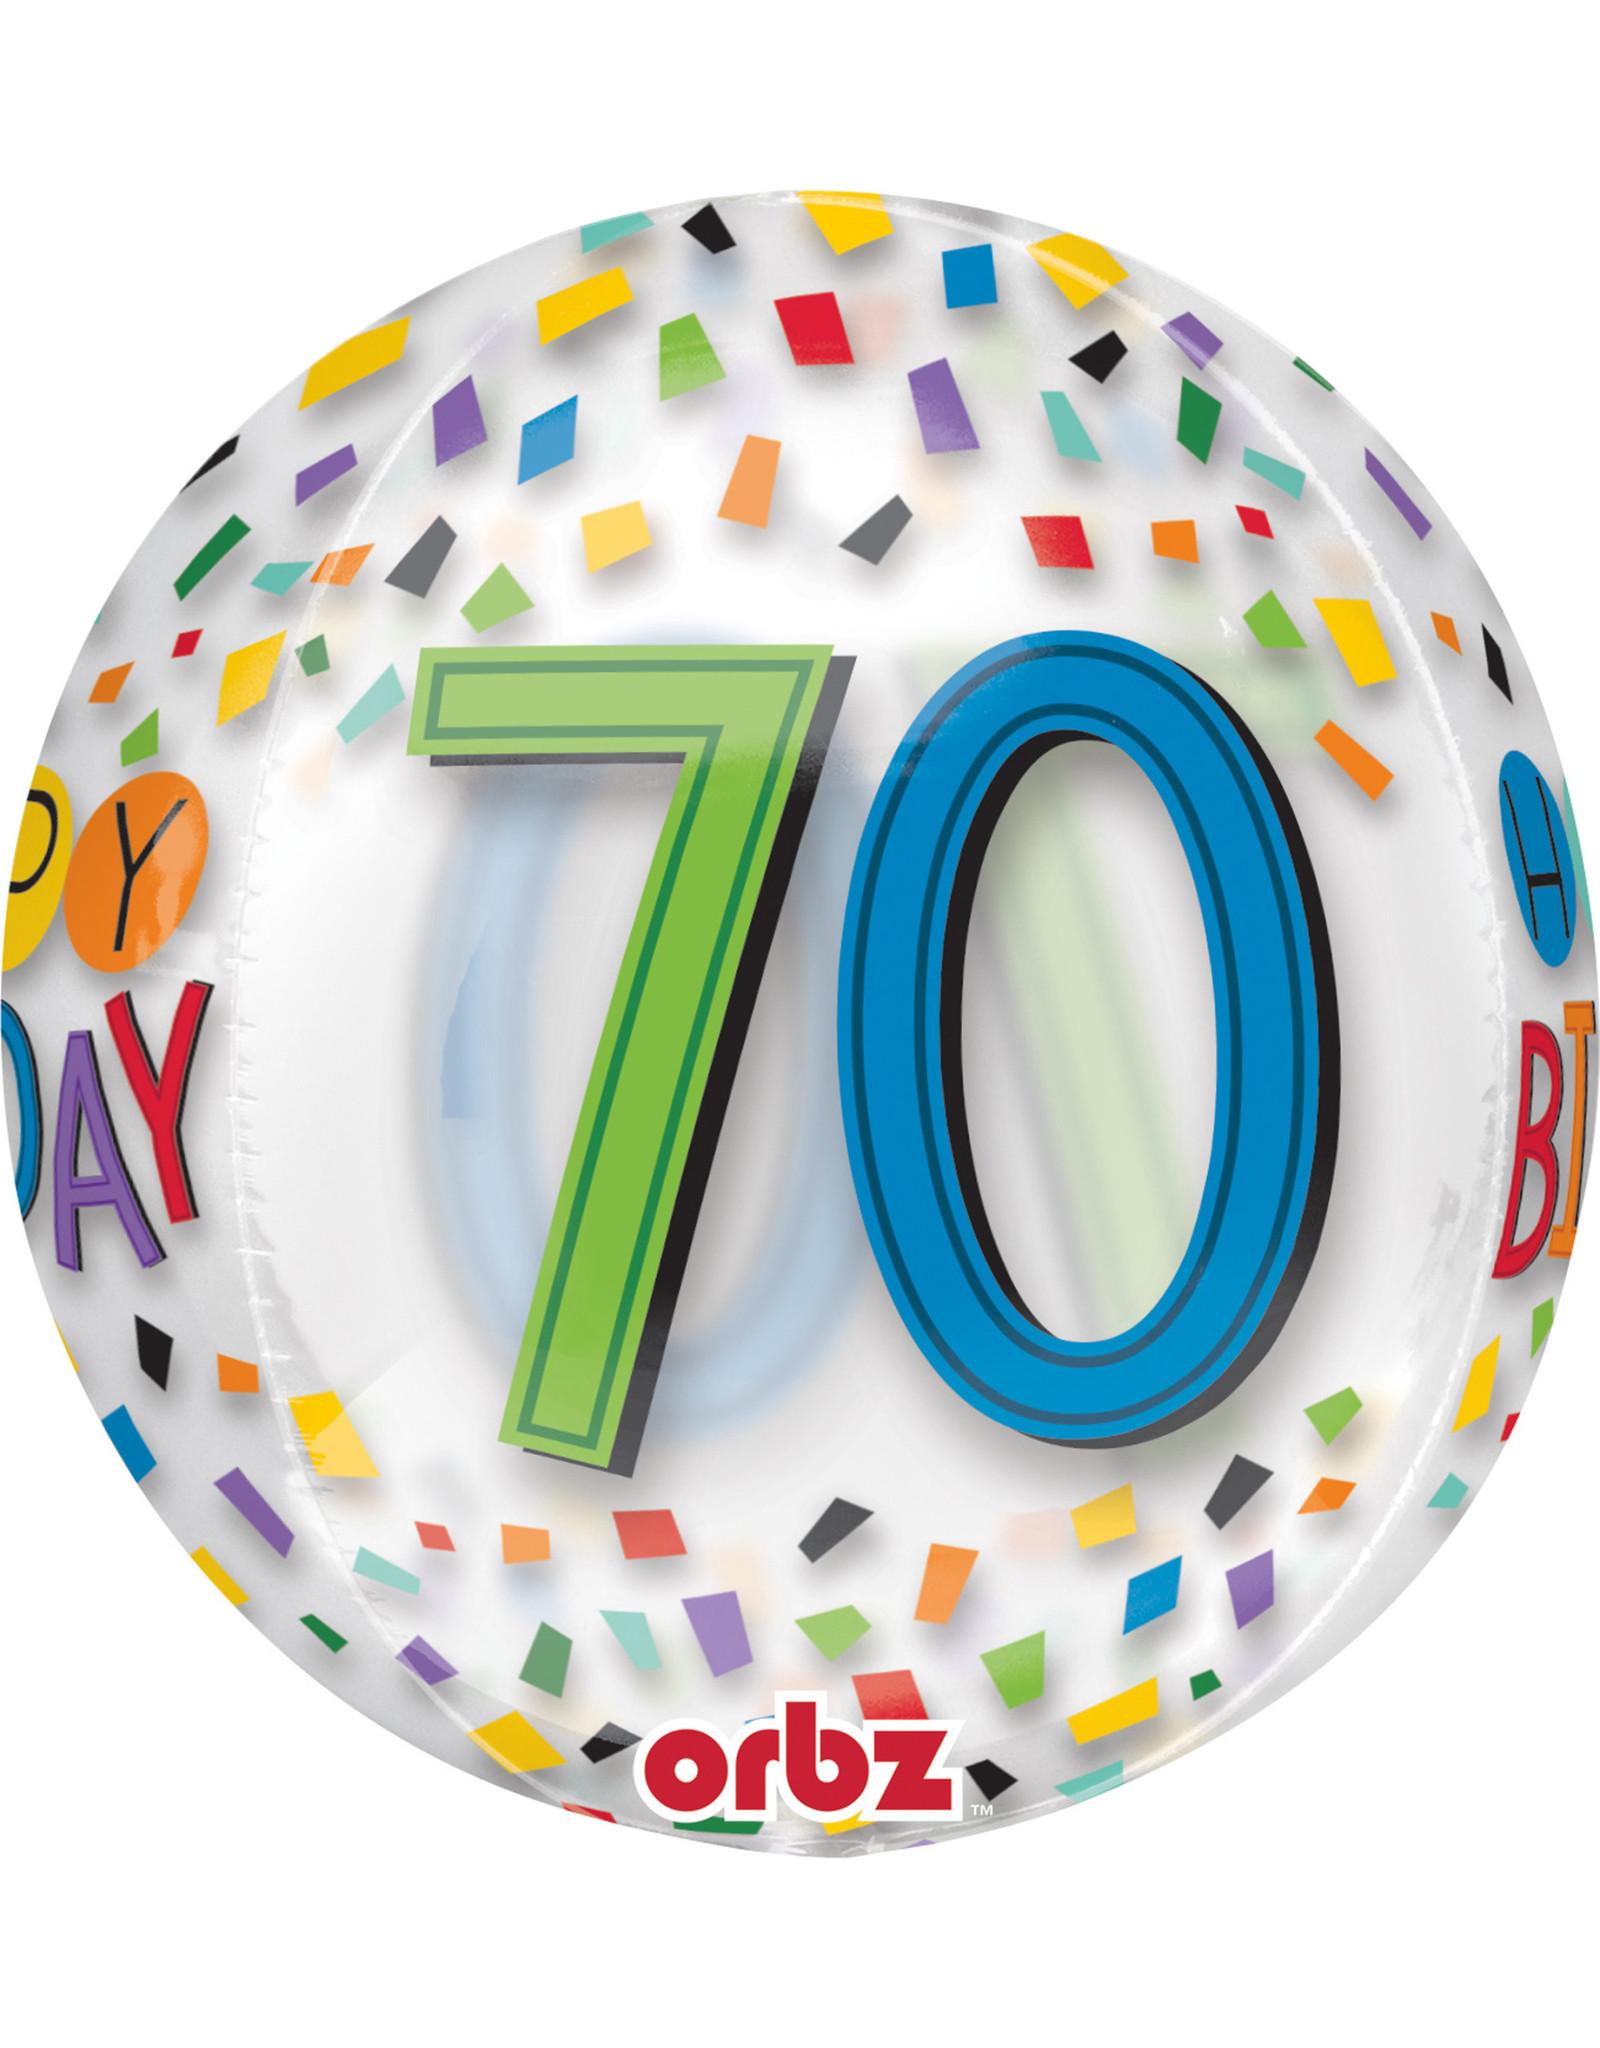 Amscan folieballon orbz confetti stijl 70 jaar 38 x 40 cm